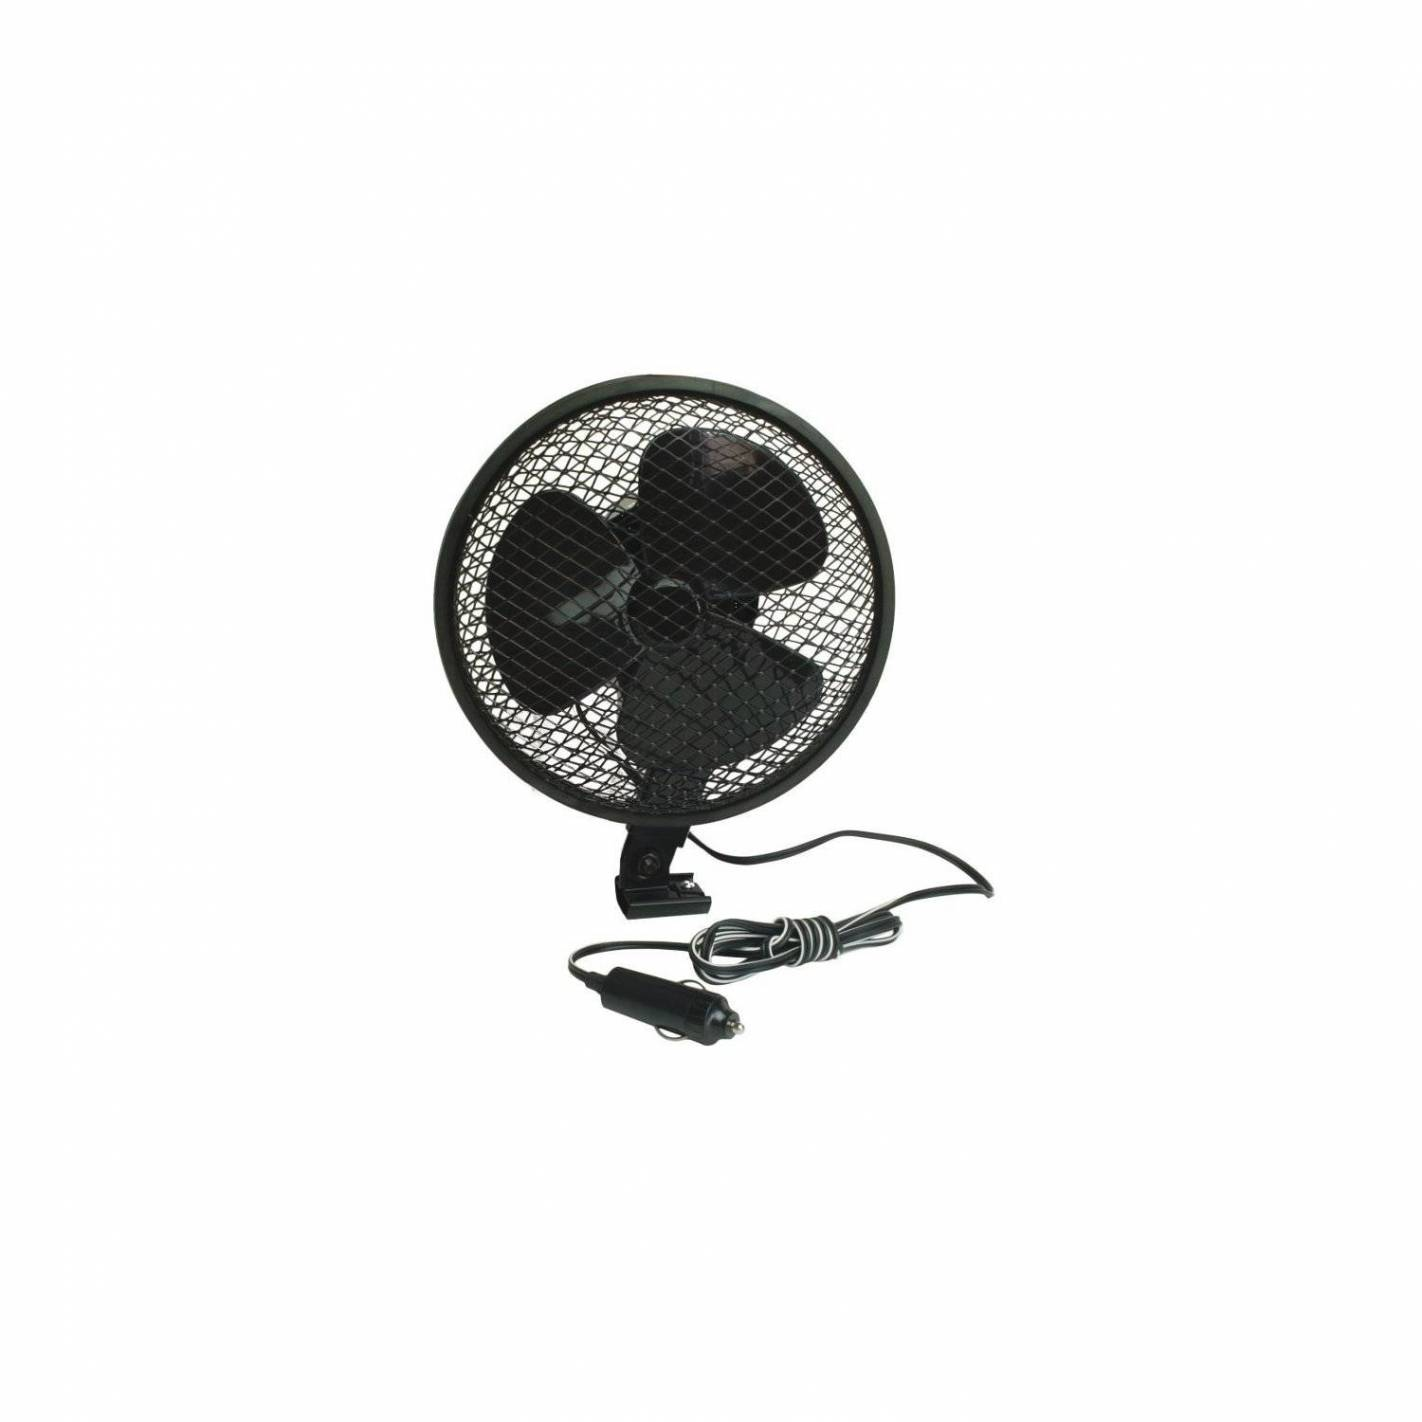 Ventilateur 12v oscillant - Aerateur salle de bain 12 volts ...